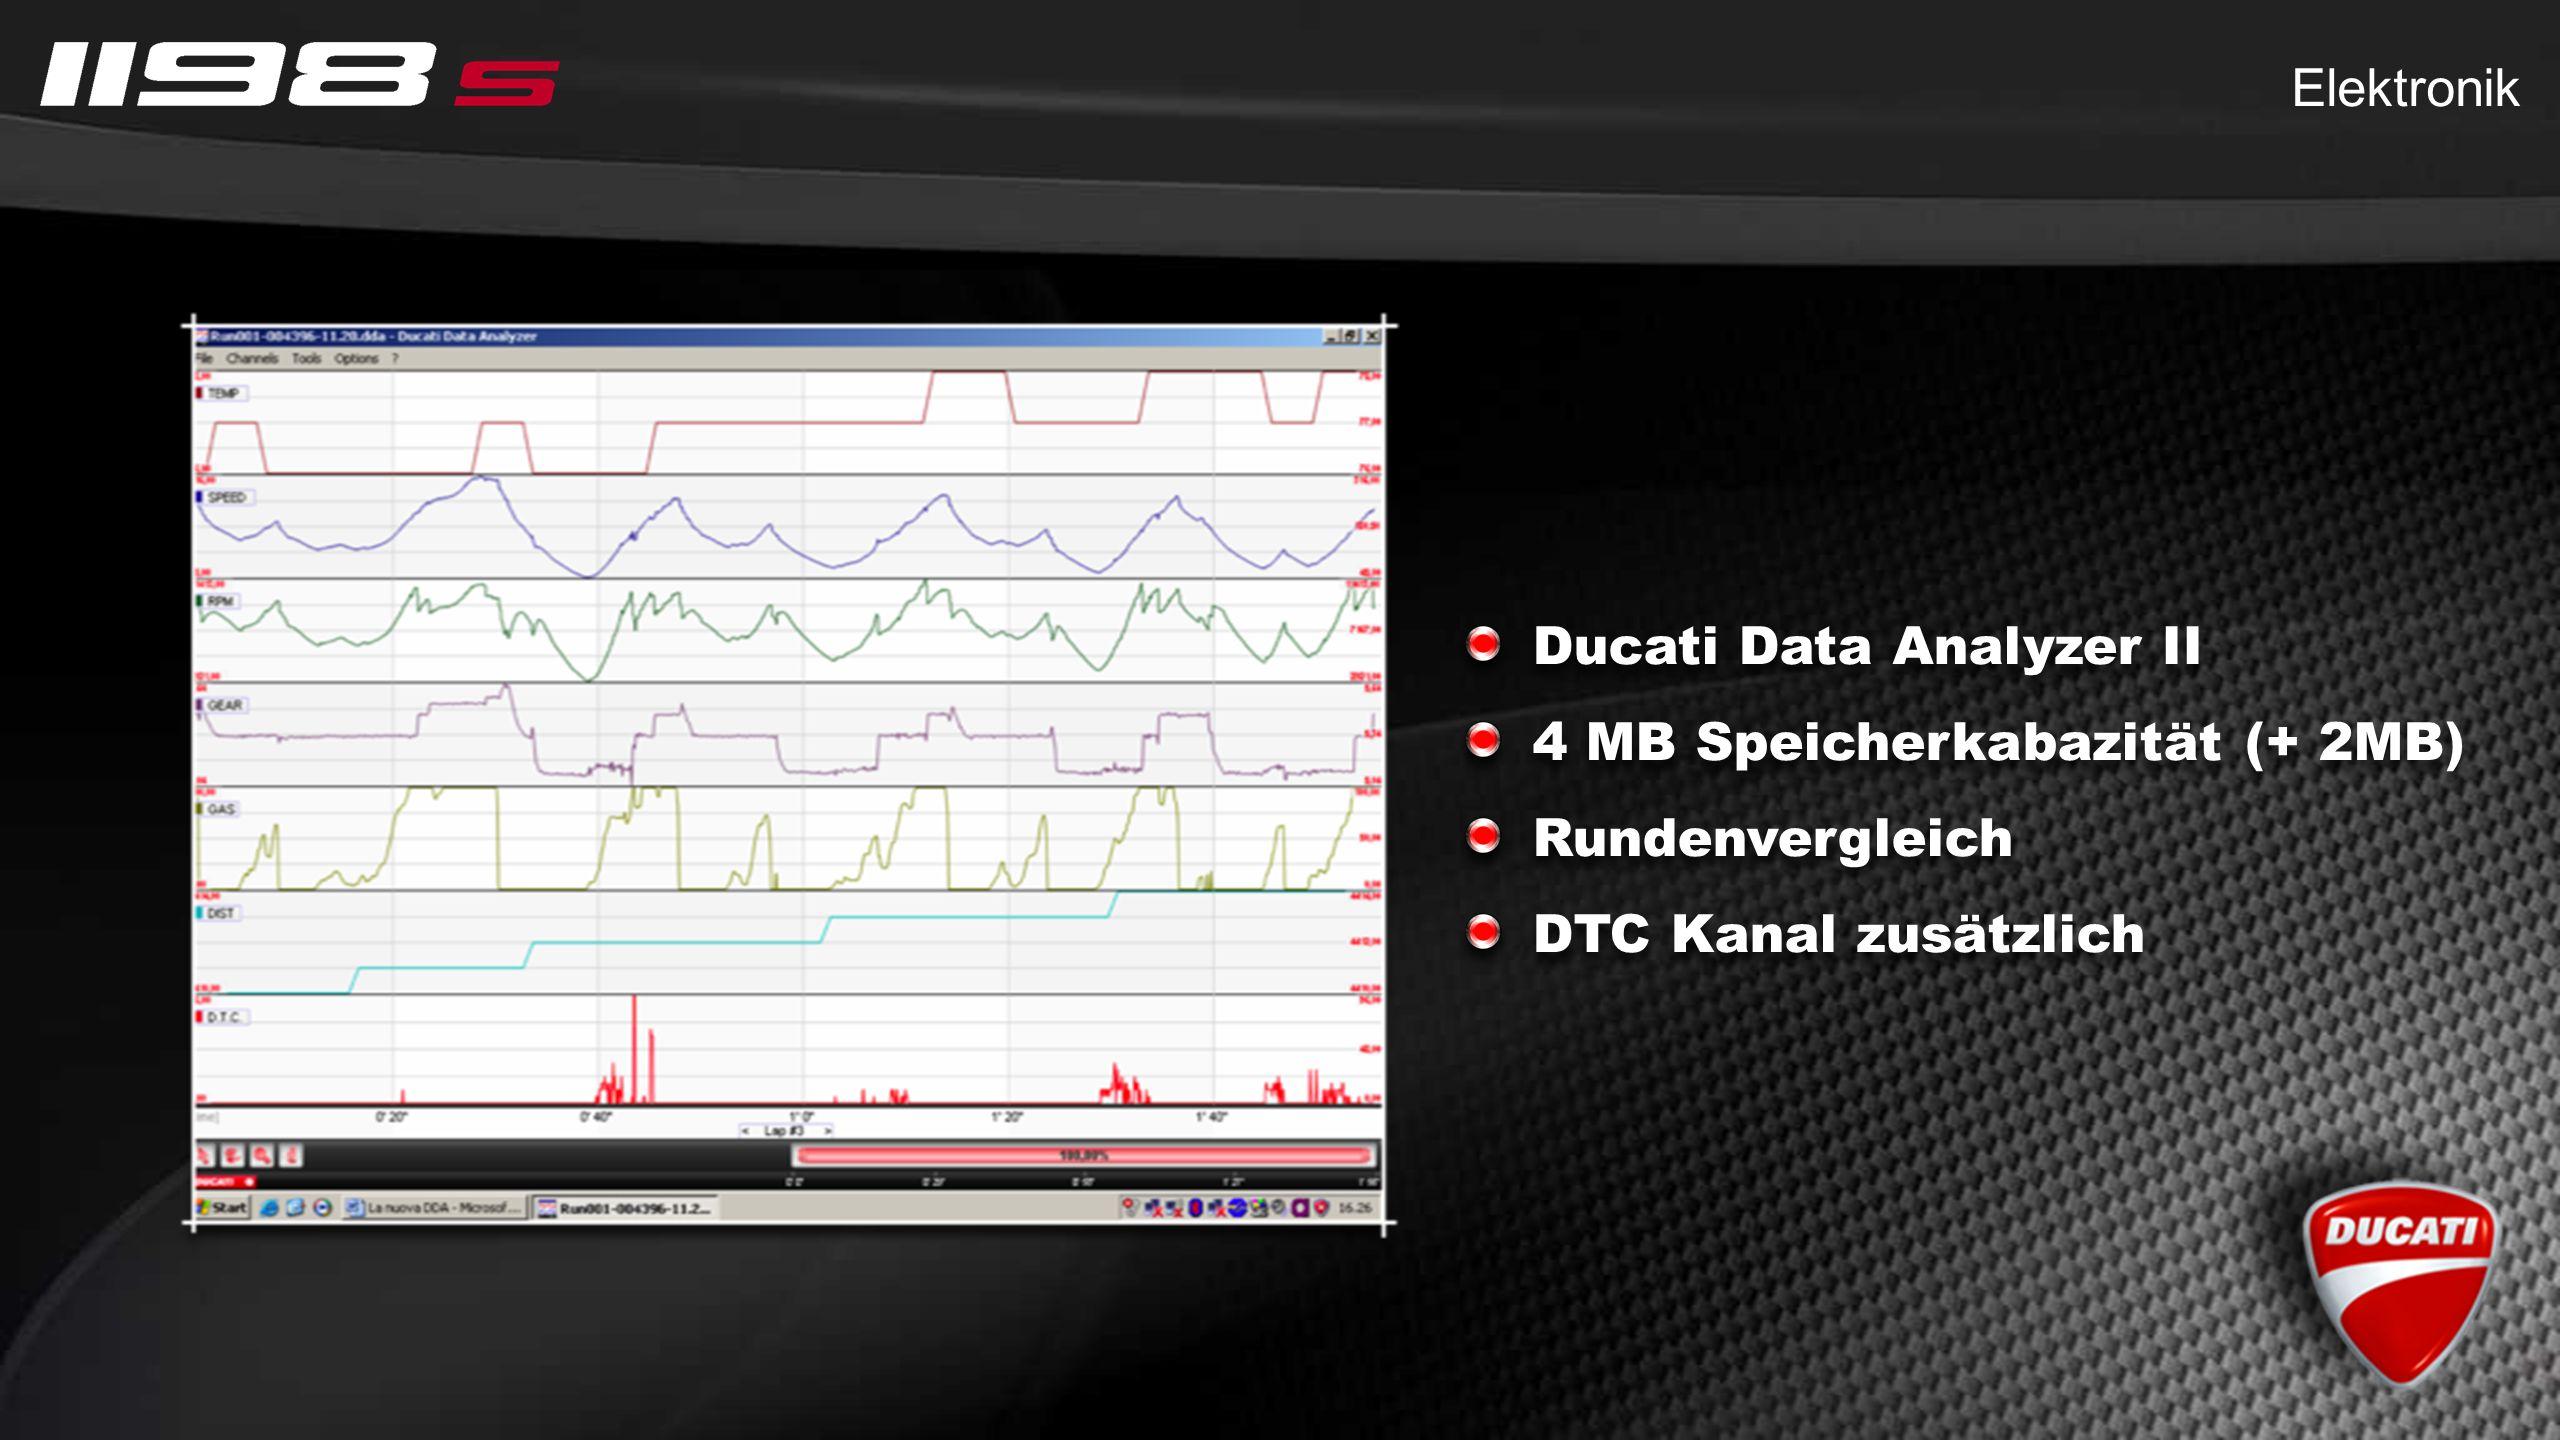 Ducati Data Analyzer II 4 MB Speicherkabazität (+ 2MB) Rundenvergleich DTC Kanal zusätzlich Ducati Data Analyzer II 4 MB Speicherkabazität (+ 2MB) Rundenvergleich DTC Kanal zusätzlich Elektronik